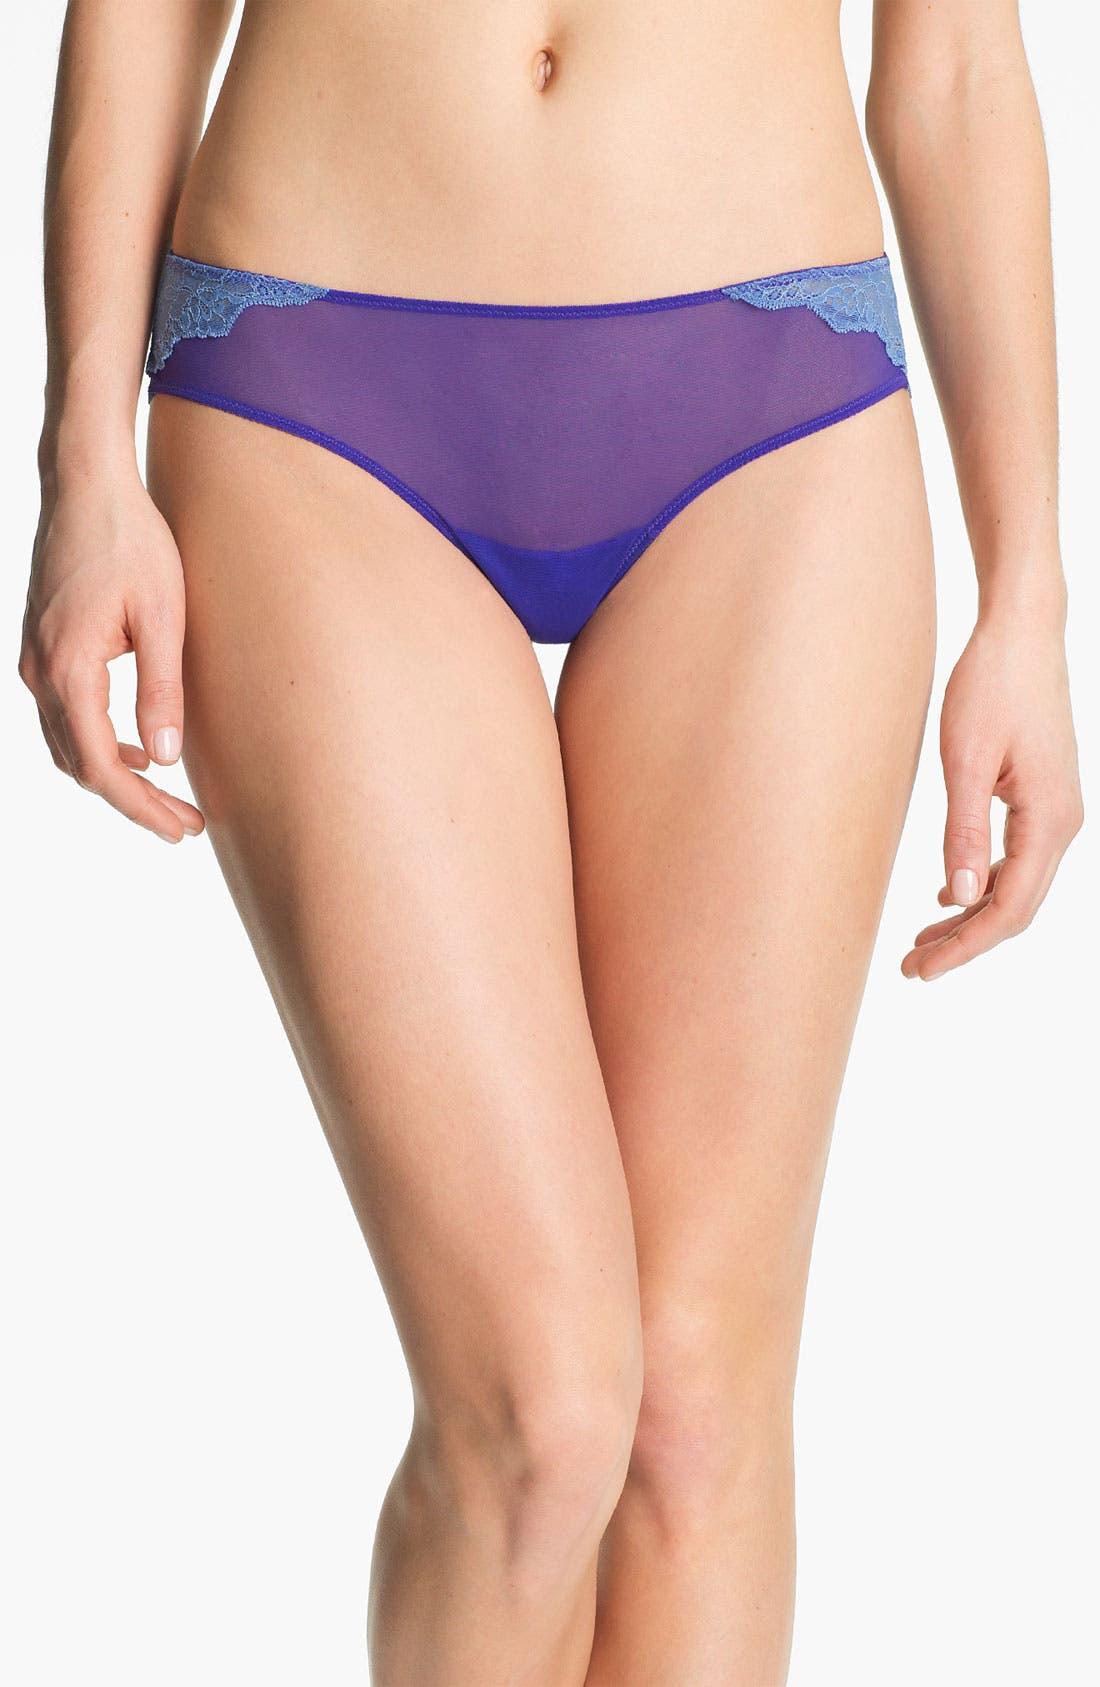 Alternate Image 1 Selected - On Gossamer 'Veiled Lace' Thong